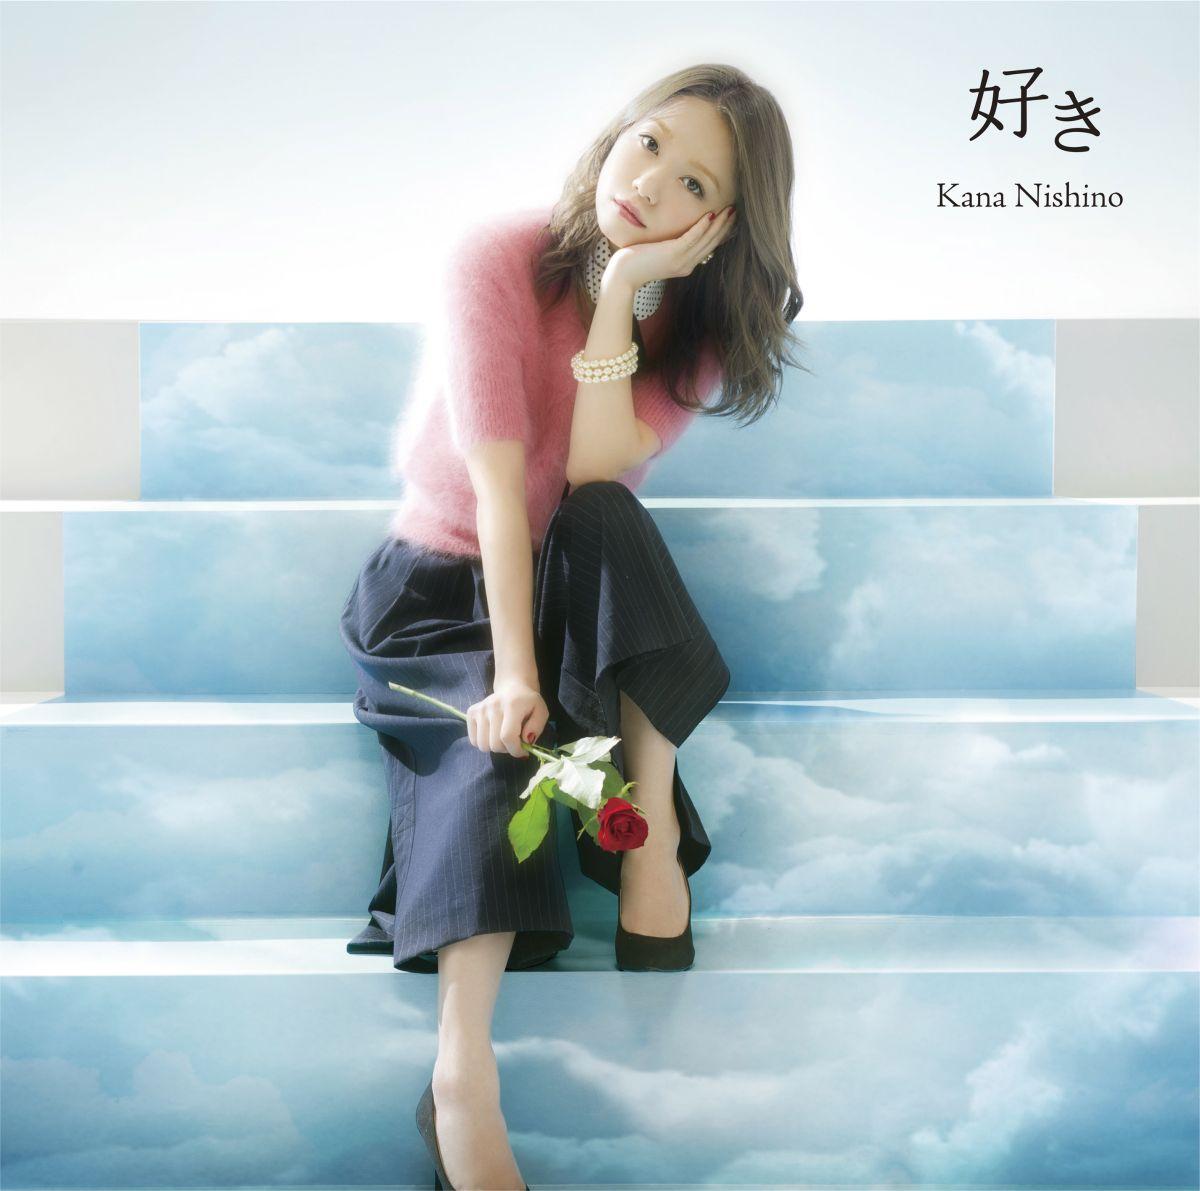 20160311.22 Kana Nishino - Suki cover 2.jpg